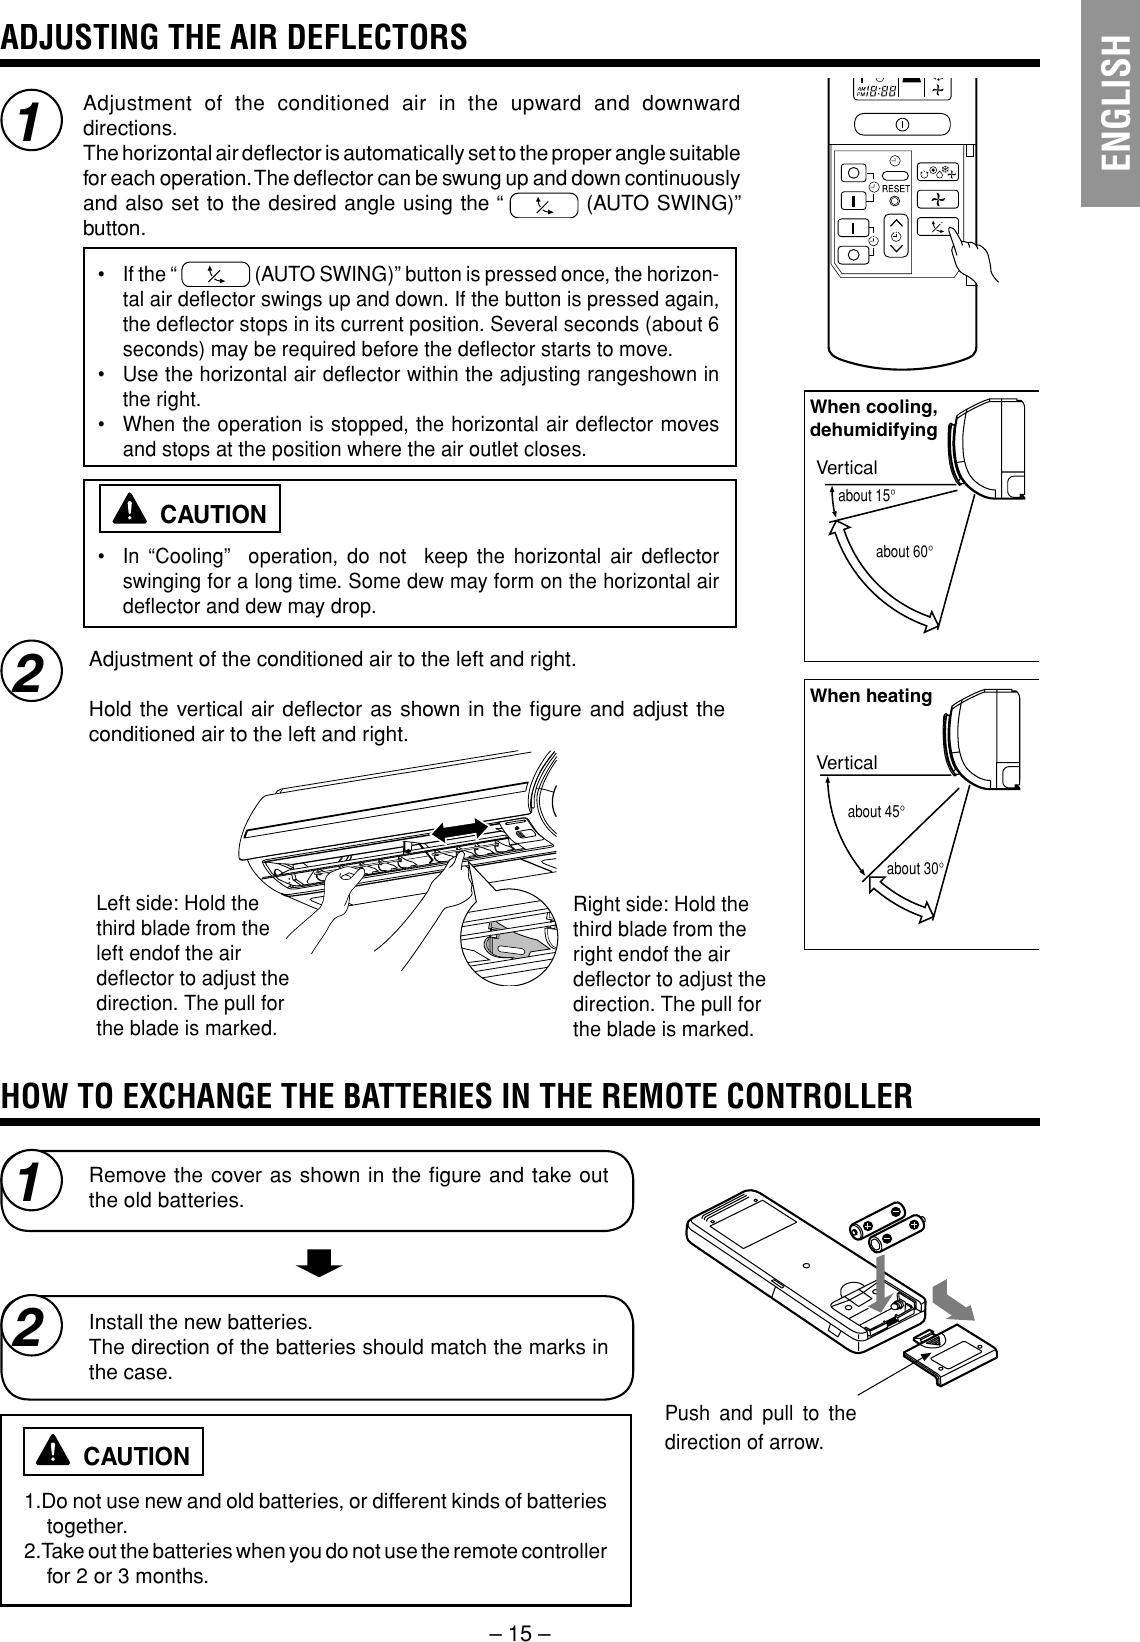 Hitachi Air Conditioner Ras 25Yha Rac 35Yha Indoor Unit Users Manual